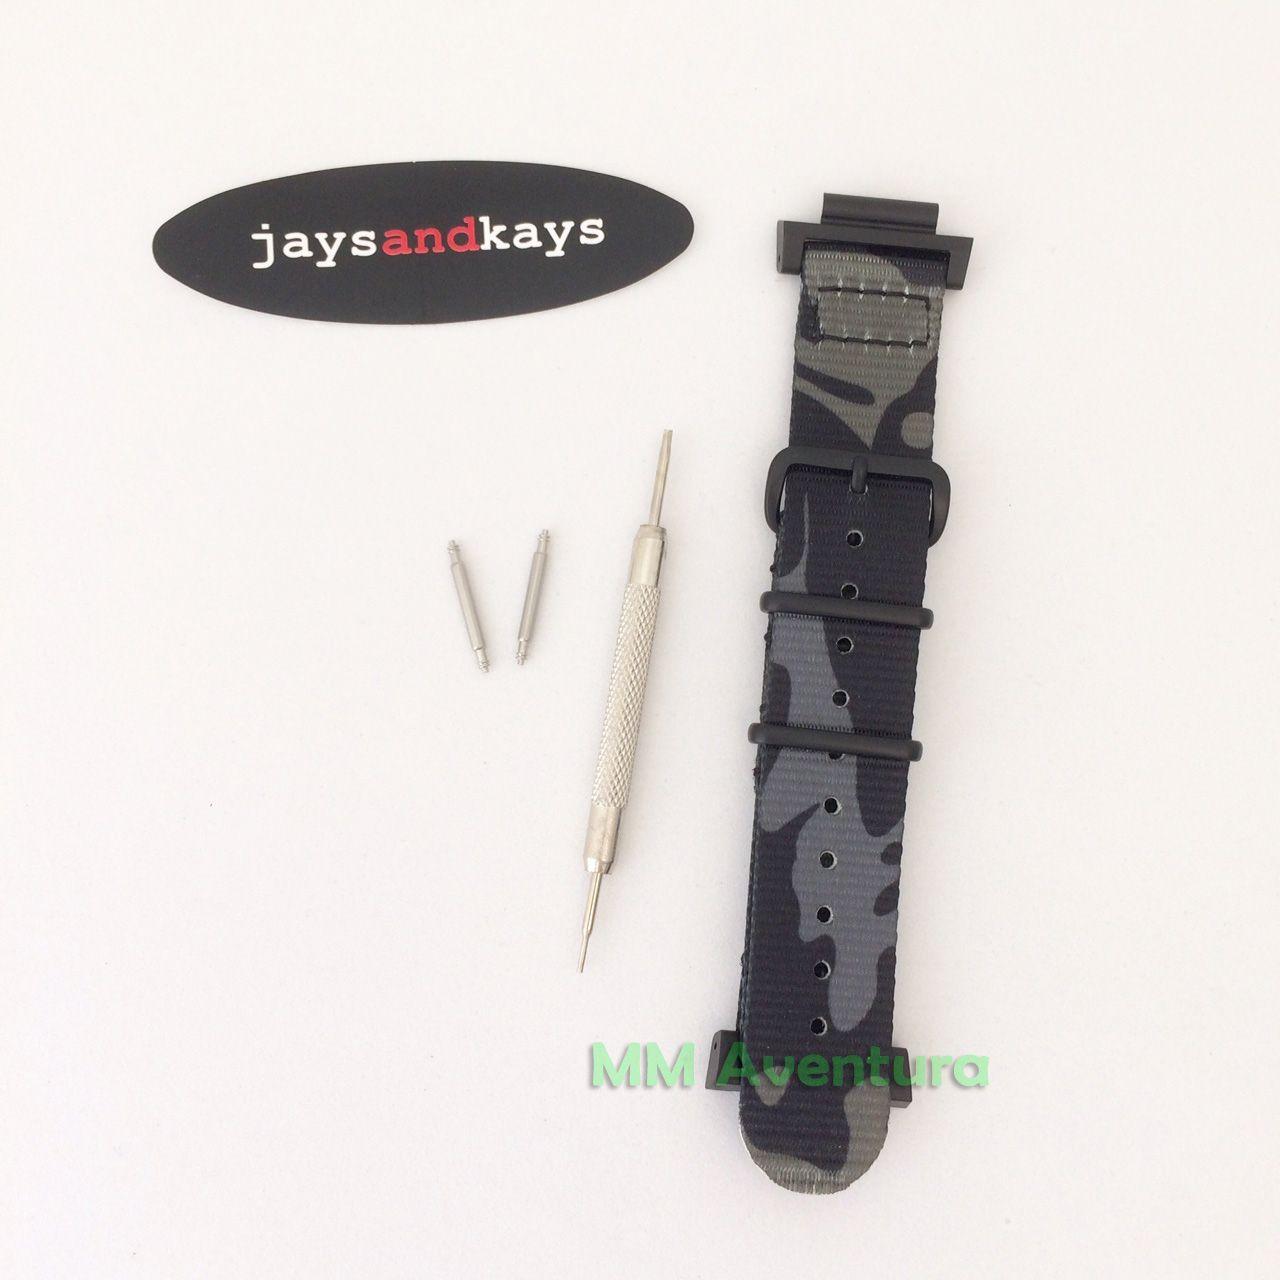 Pulseira Nylon 2 pç Nato Zulu JaysAndKays p/ G-Shock 22mm GX56 GD350 GA110 etc